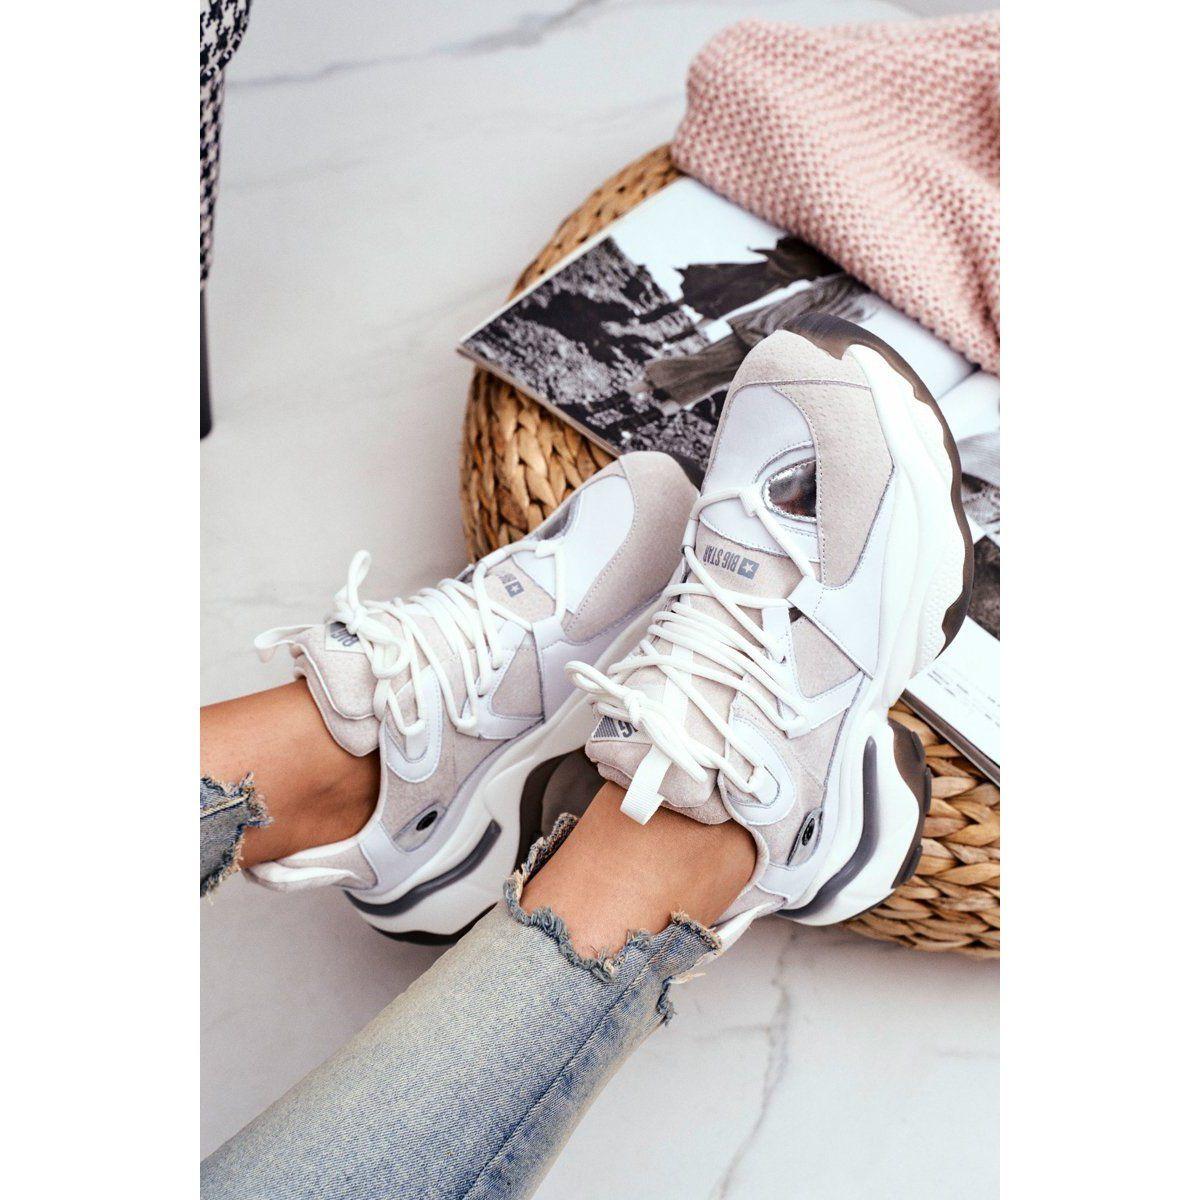 Damskie Sportowe Obuwie Big Star By Daniel Lopez Biale Ff274a576 Saucony Sneaker Sneakers Nike Nike Air Max